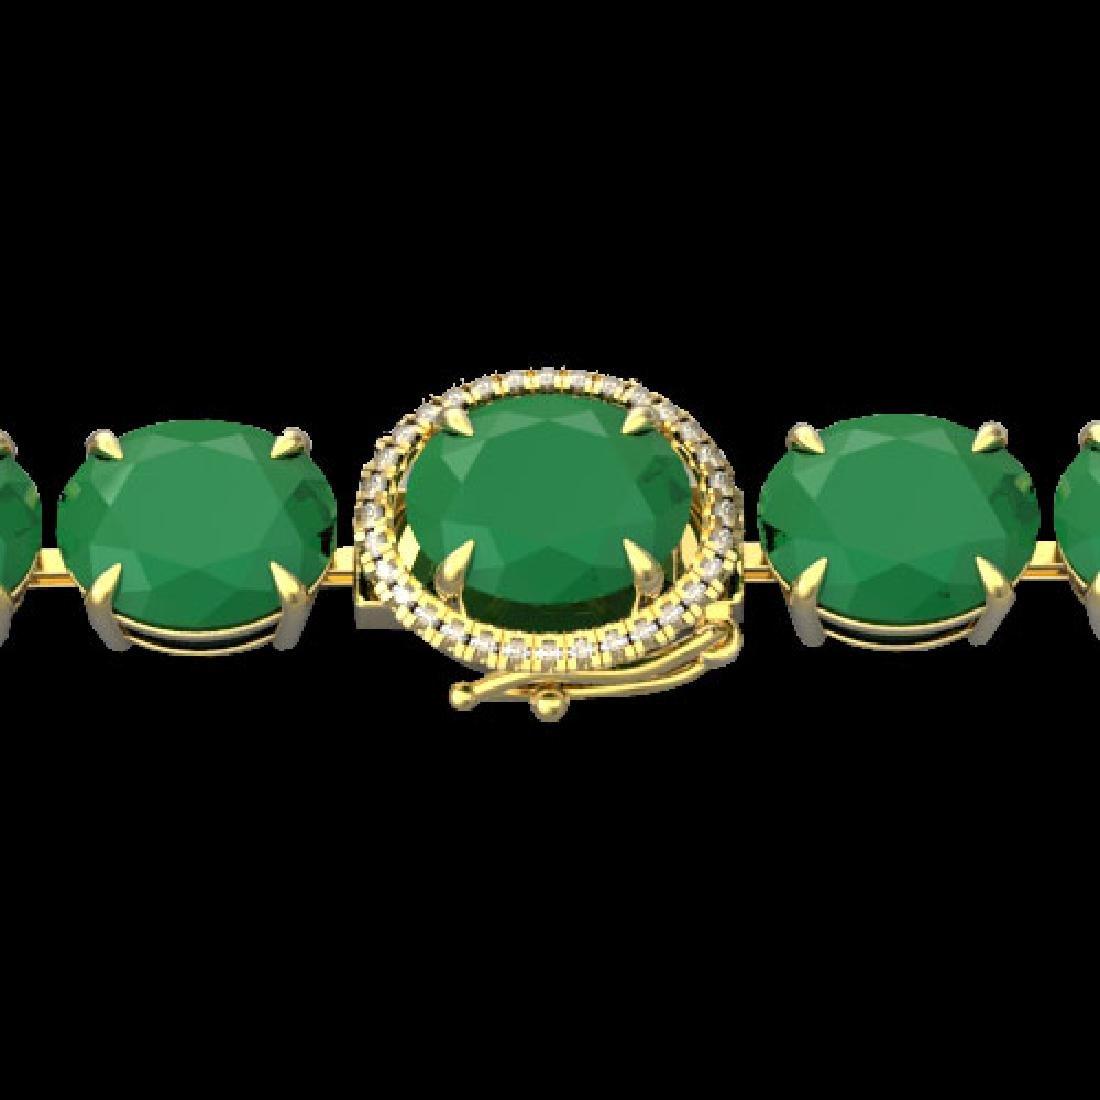 76 CTW Emerald & Micro Pave VS/SI Diamond Halo Bracelet